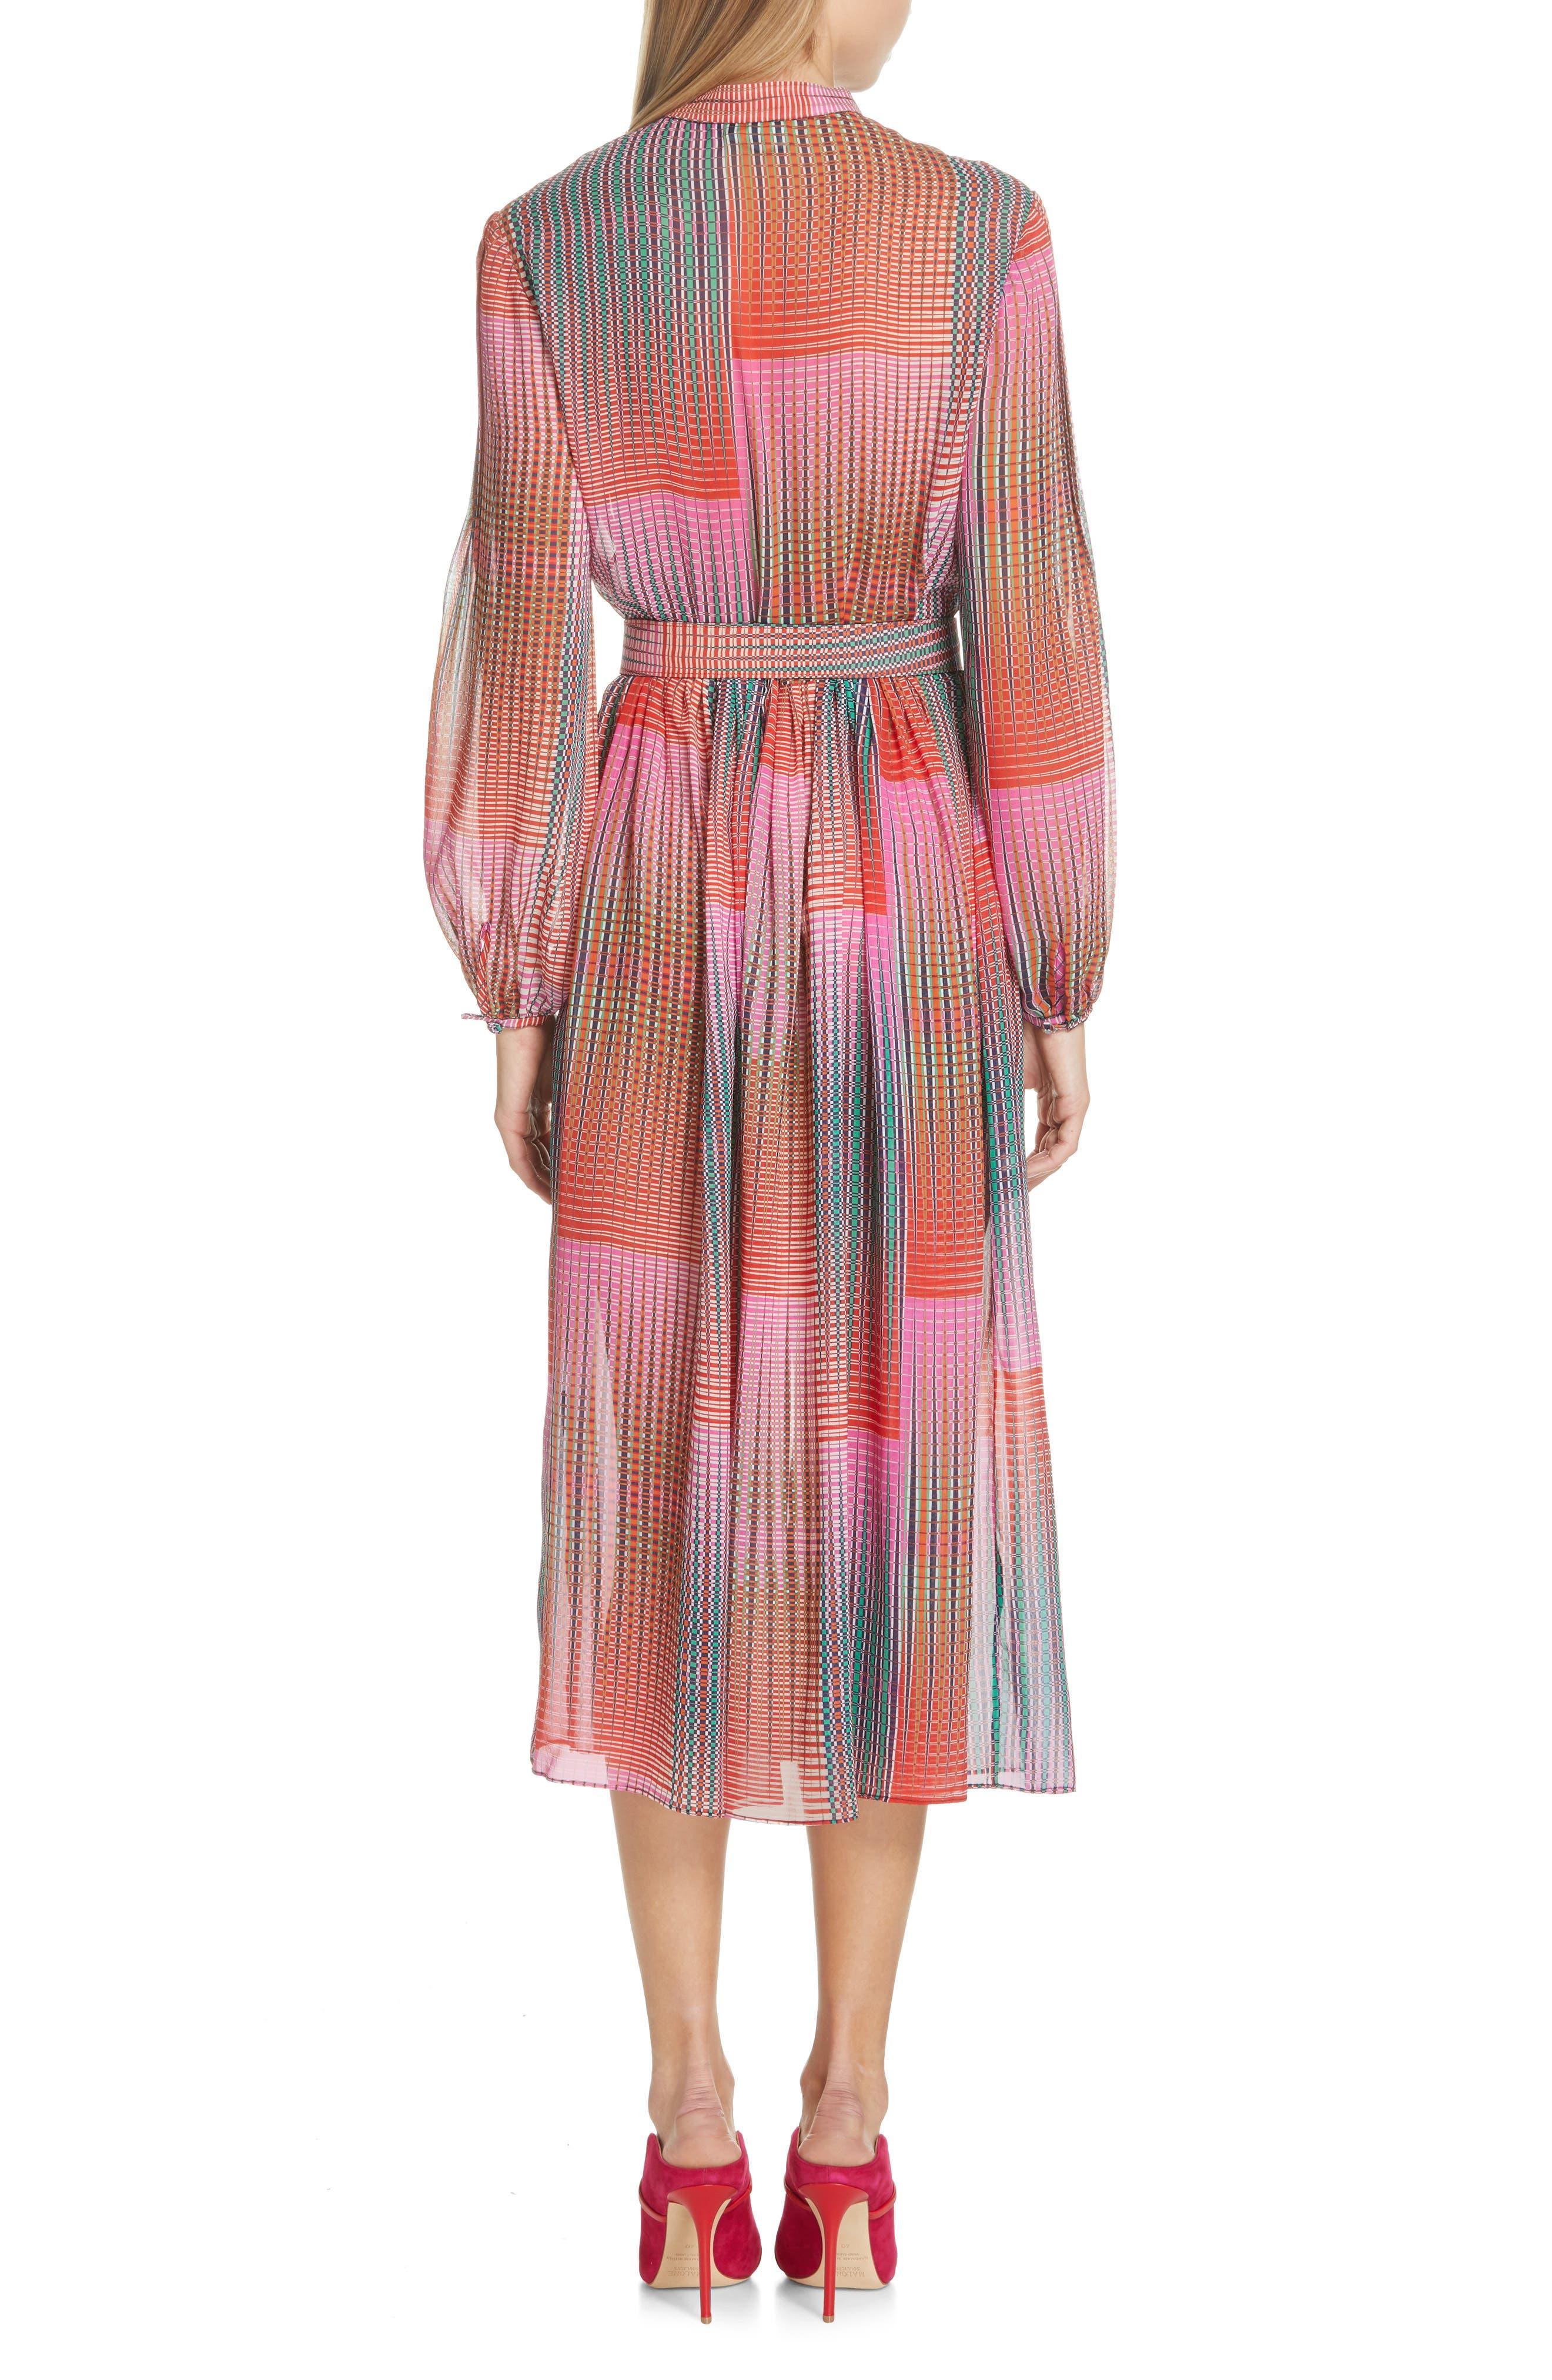 SALONI, Raquel Belted Silk Midi Dress, Alternate thumbnail 2, color, EMERALD ILLUSION